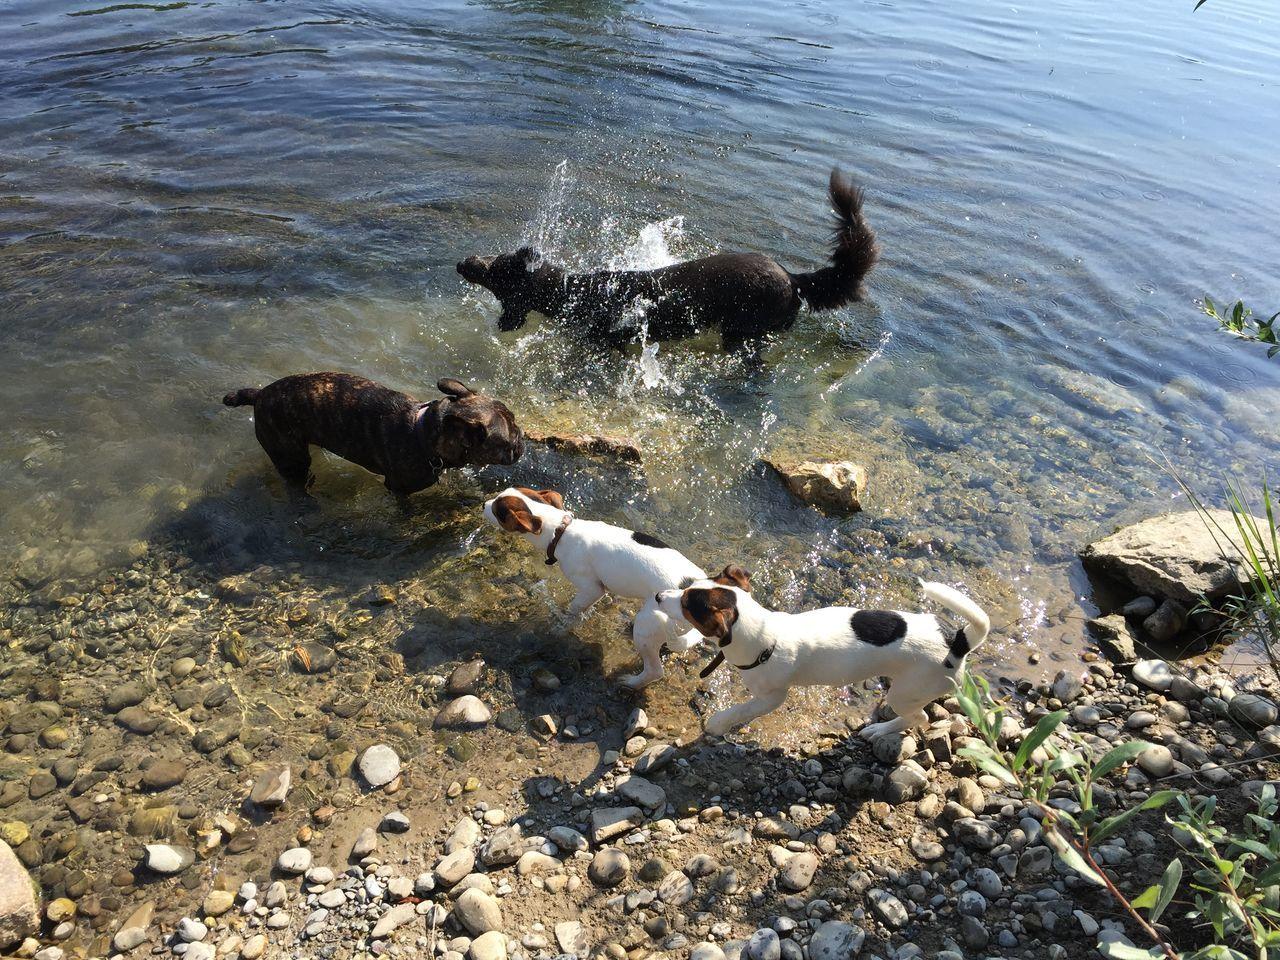 Frenchbulldog Pet Photography  Pet Cute Pets French Bulldog Pets Animal Jack Russell Dogs Dog